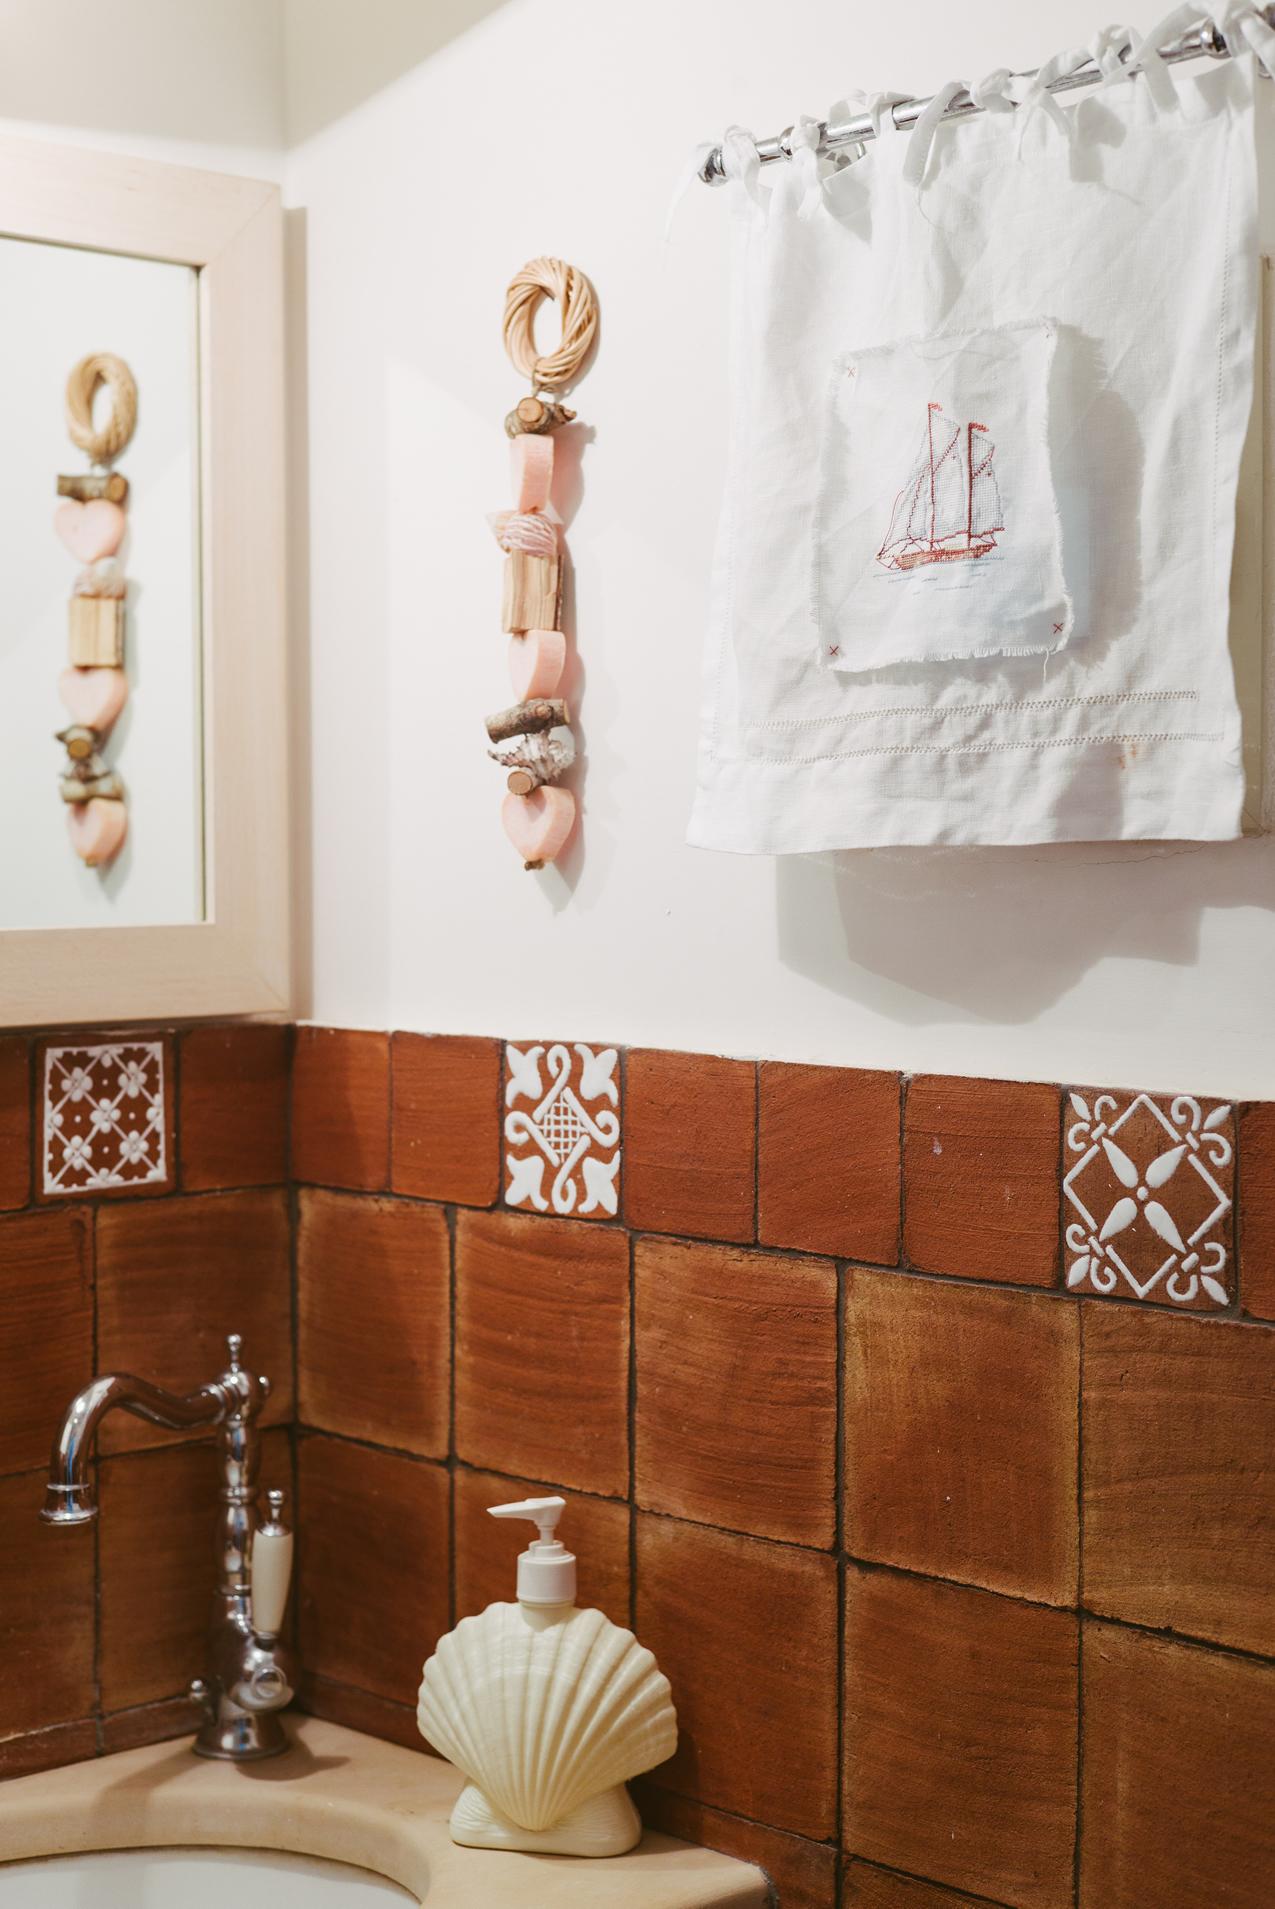 21sampieri-casa-vacanze-sicilia-appartamento-sicily-holiday-apartment-casa-del-pescatore-italia-italy.jpg